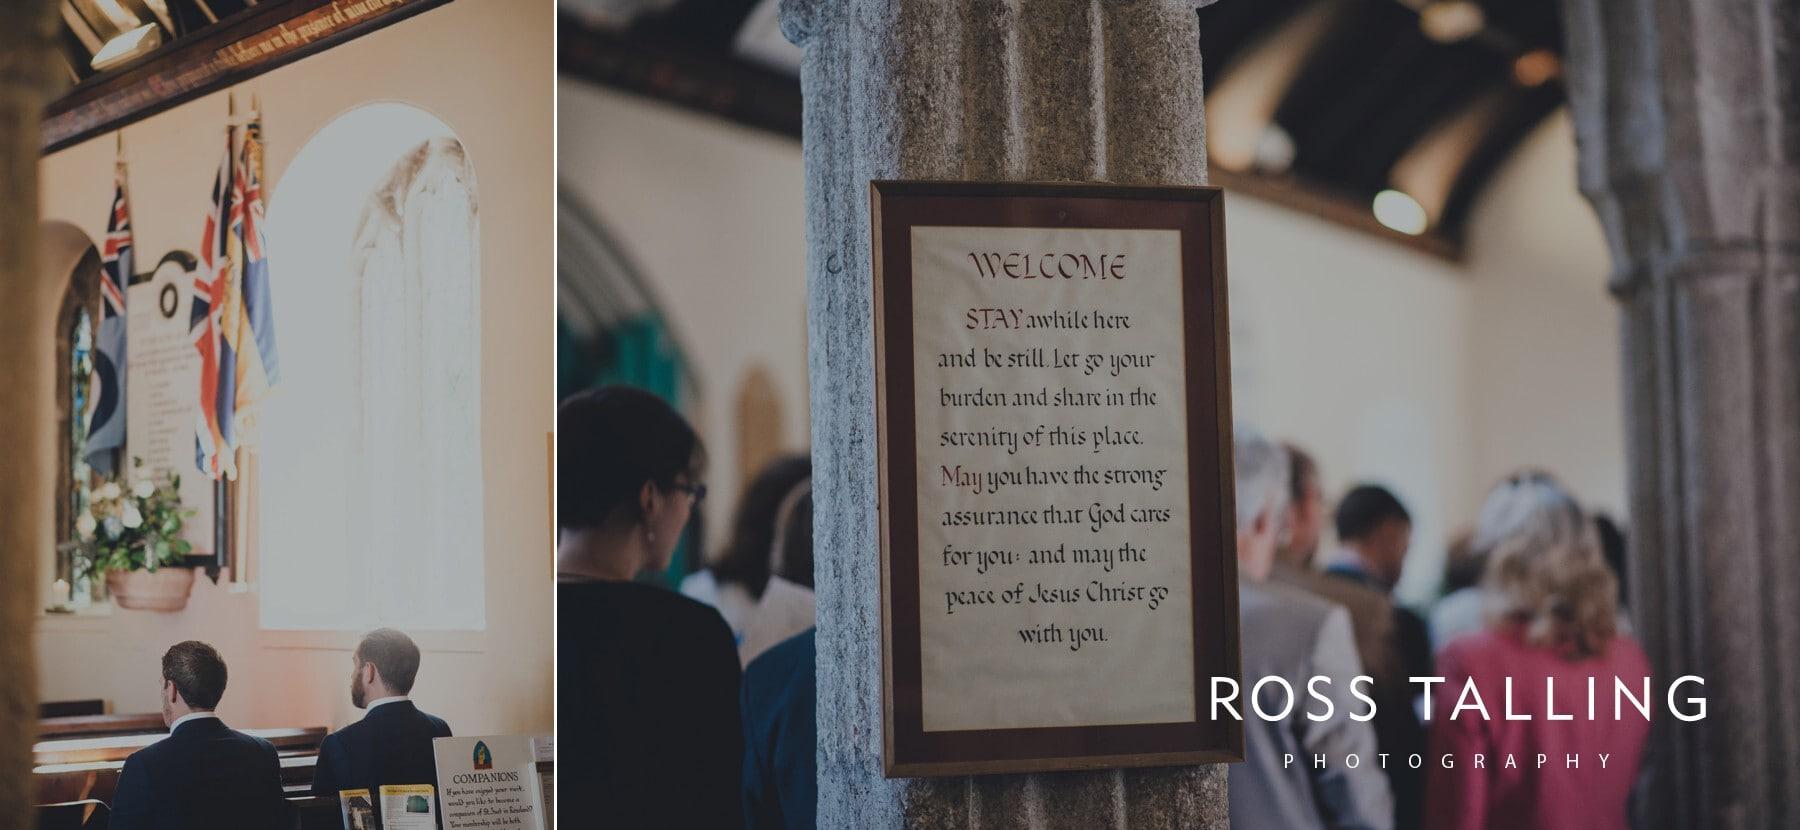 laura-matts-rosevine-hotel-wedding-photography-cornwall_0074